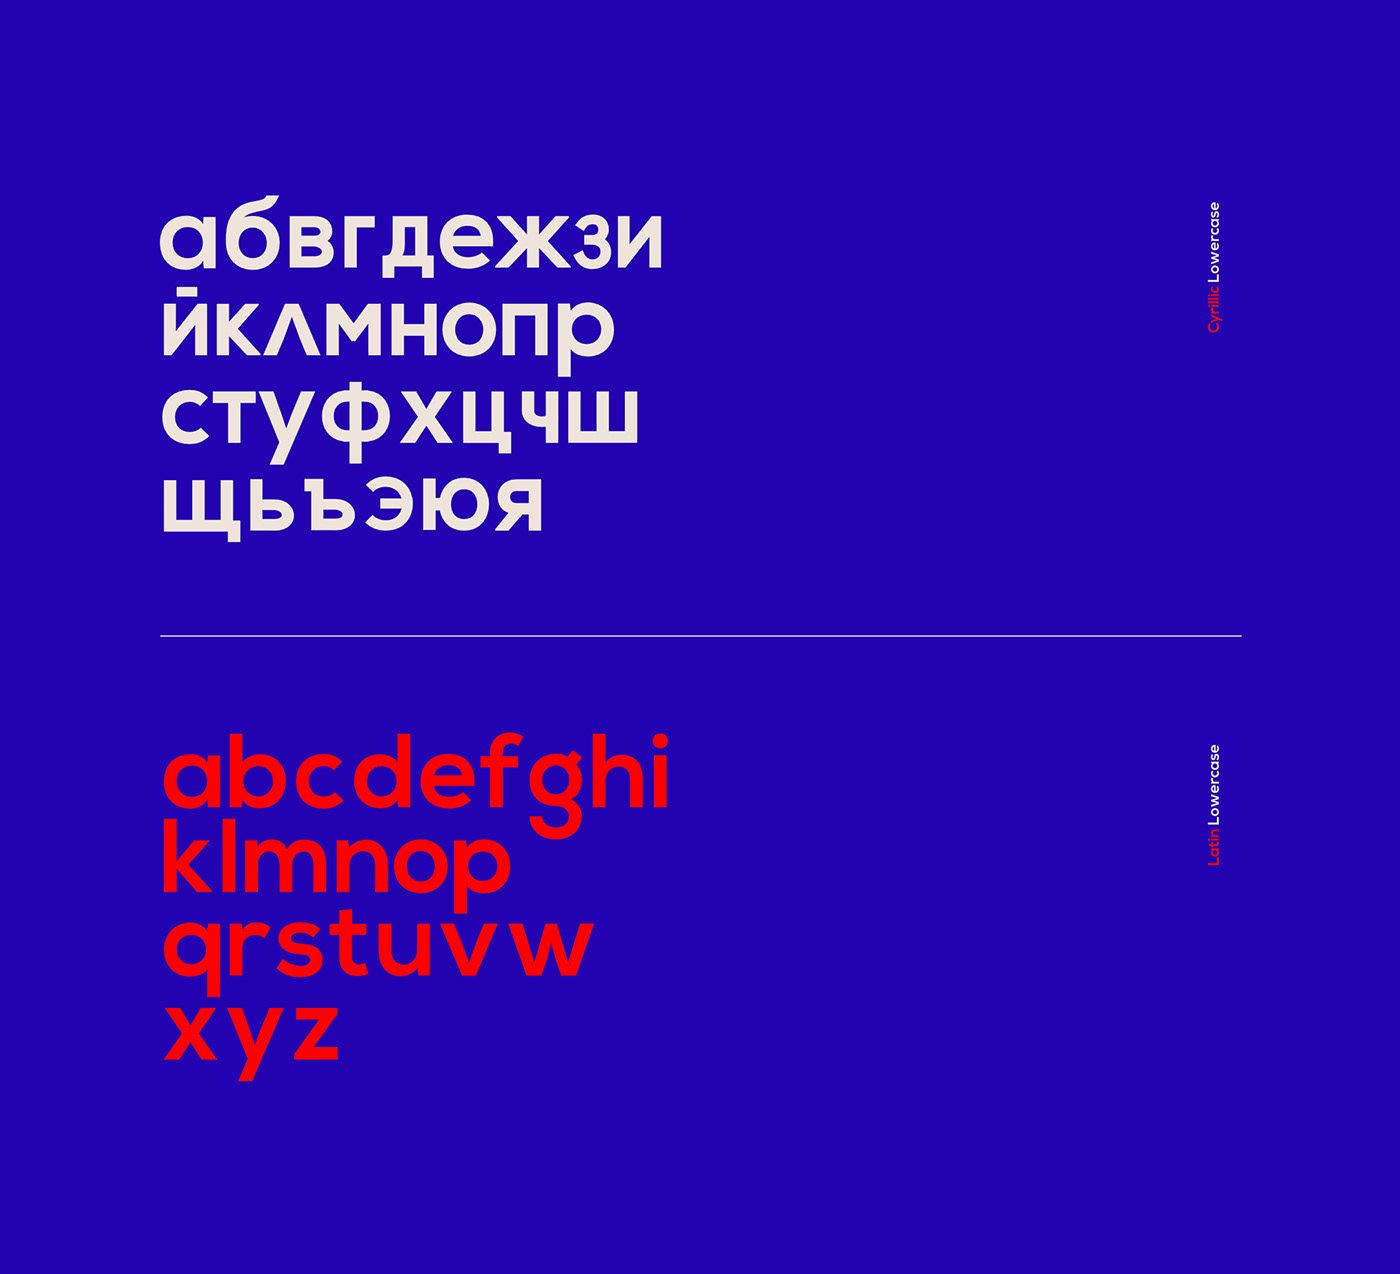 Nexa Bold Replica RU on Behance | Fonts | Fonts, Behance